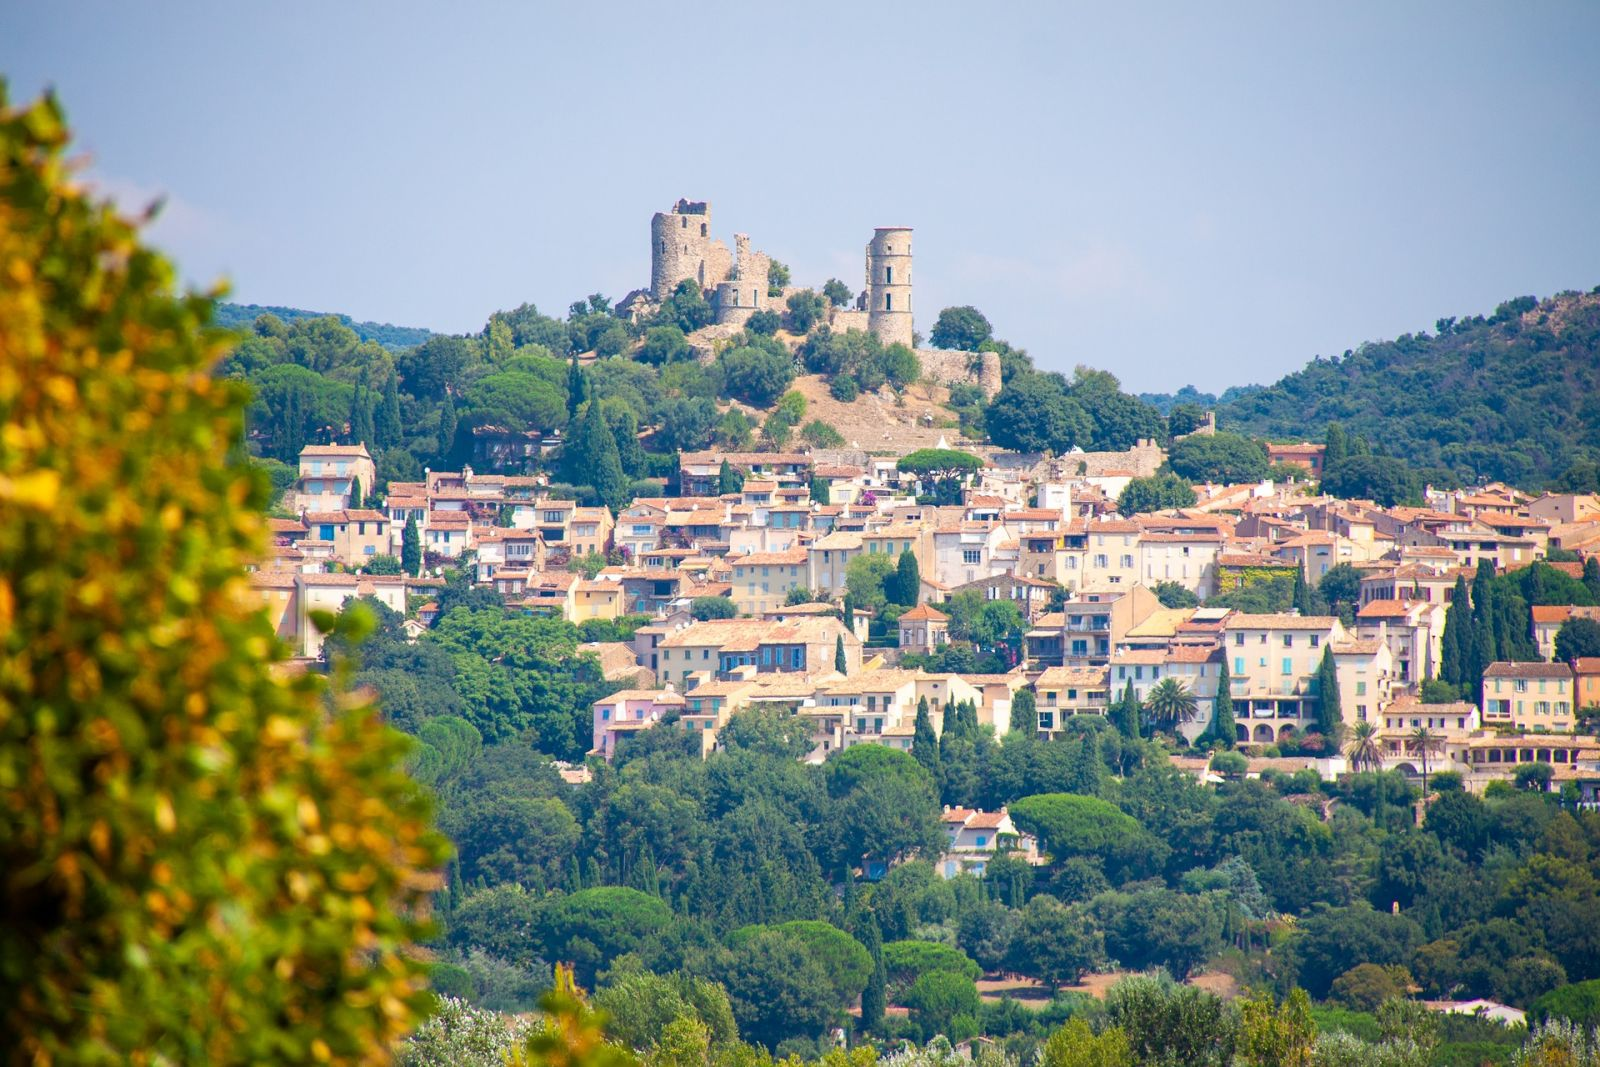 Le village de Grimaud